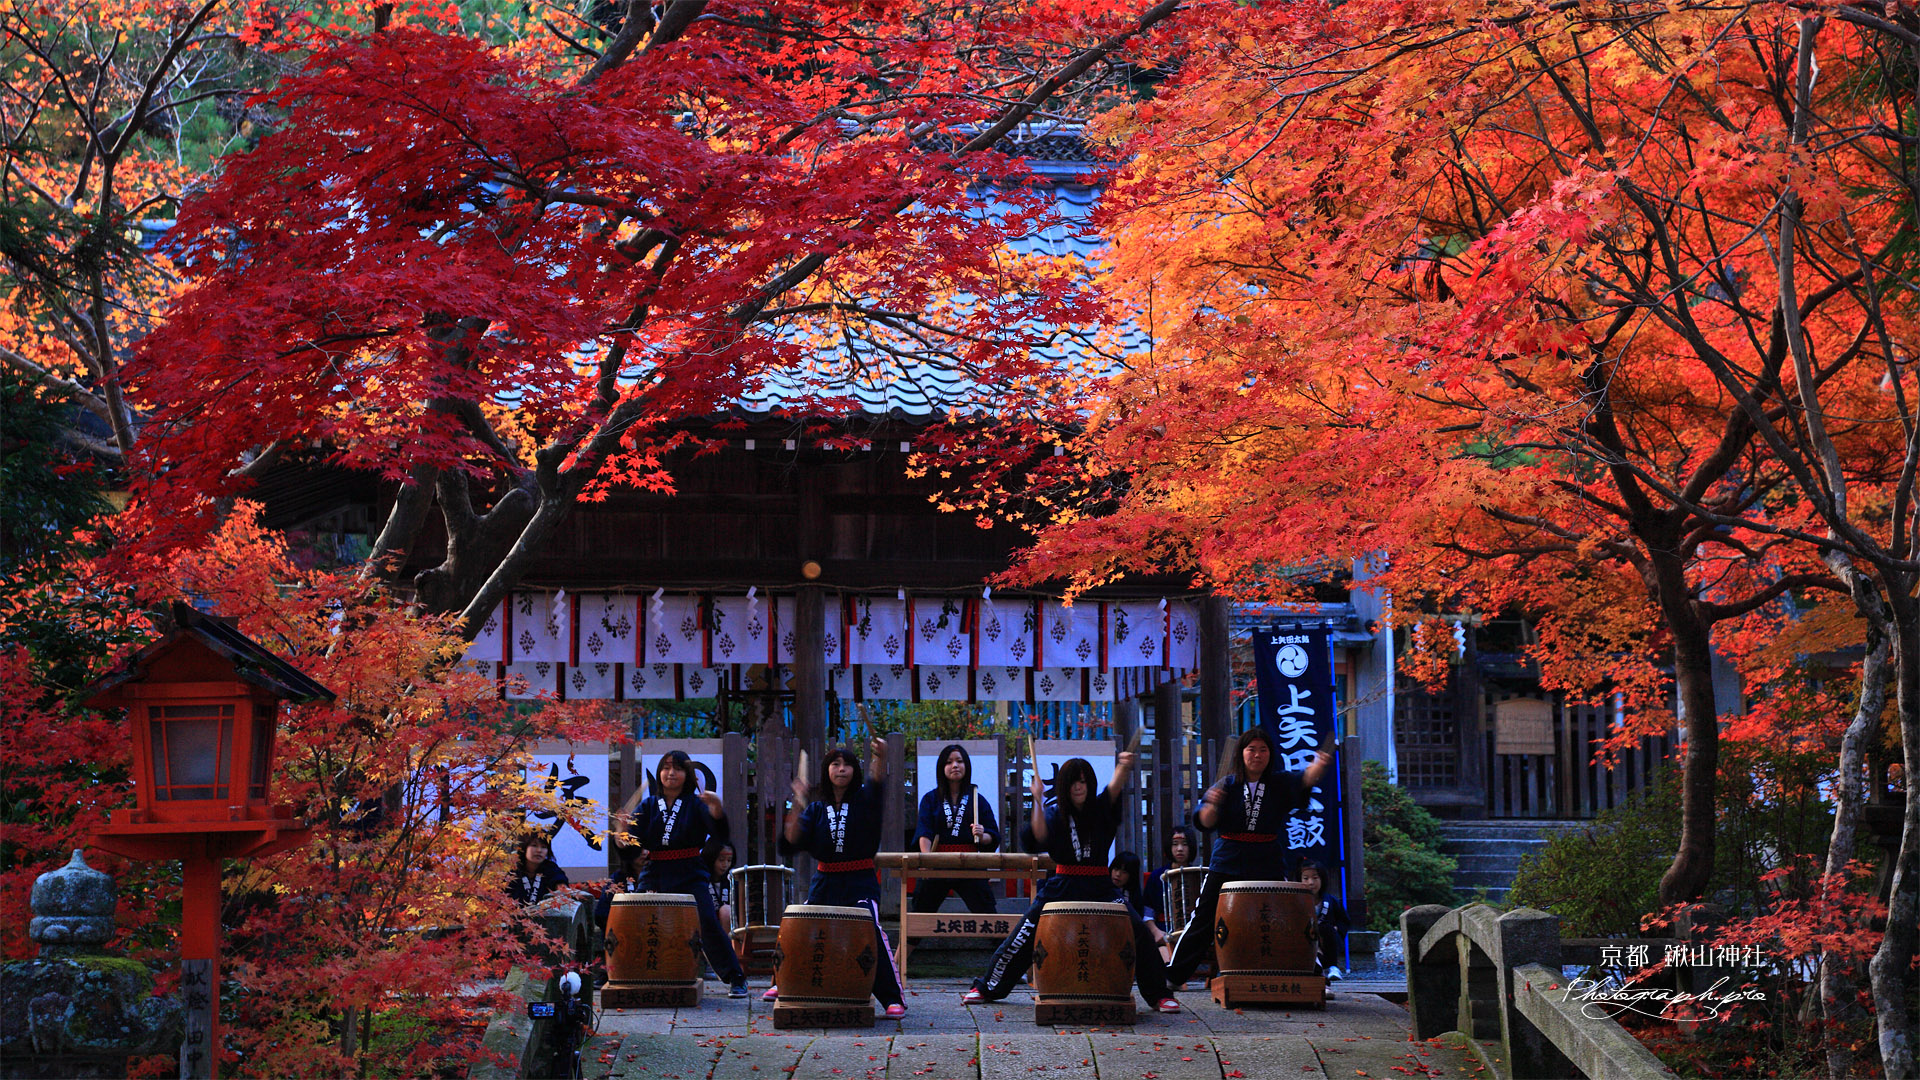 鍬山神社 紅葉と奉納太鼓